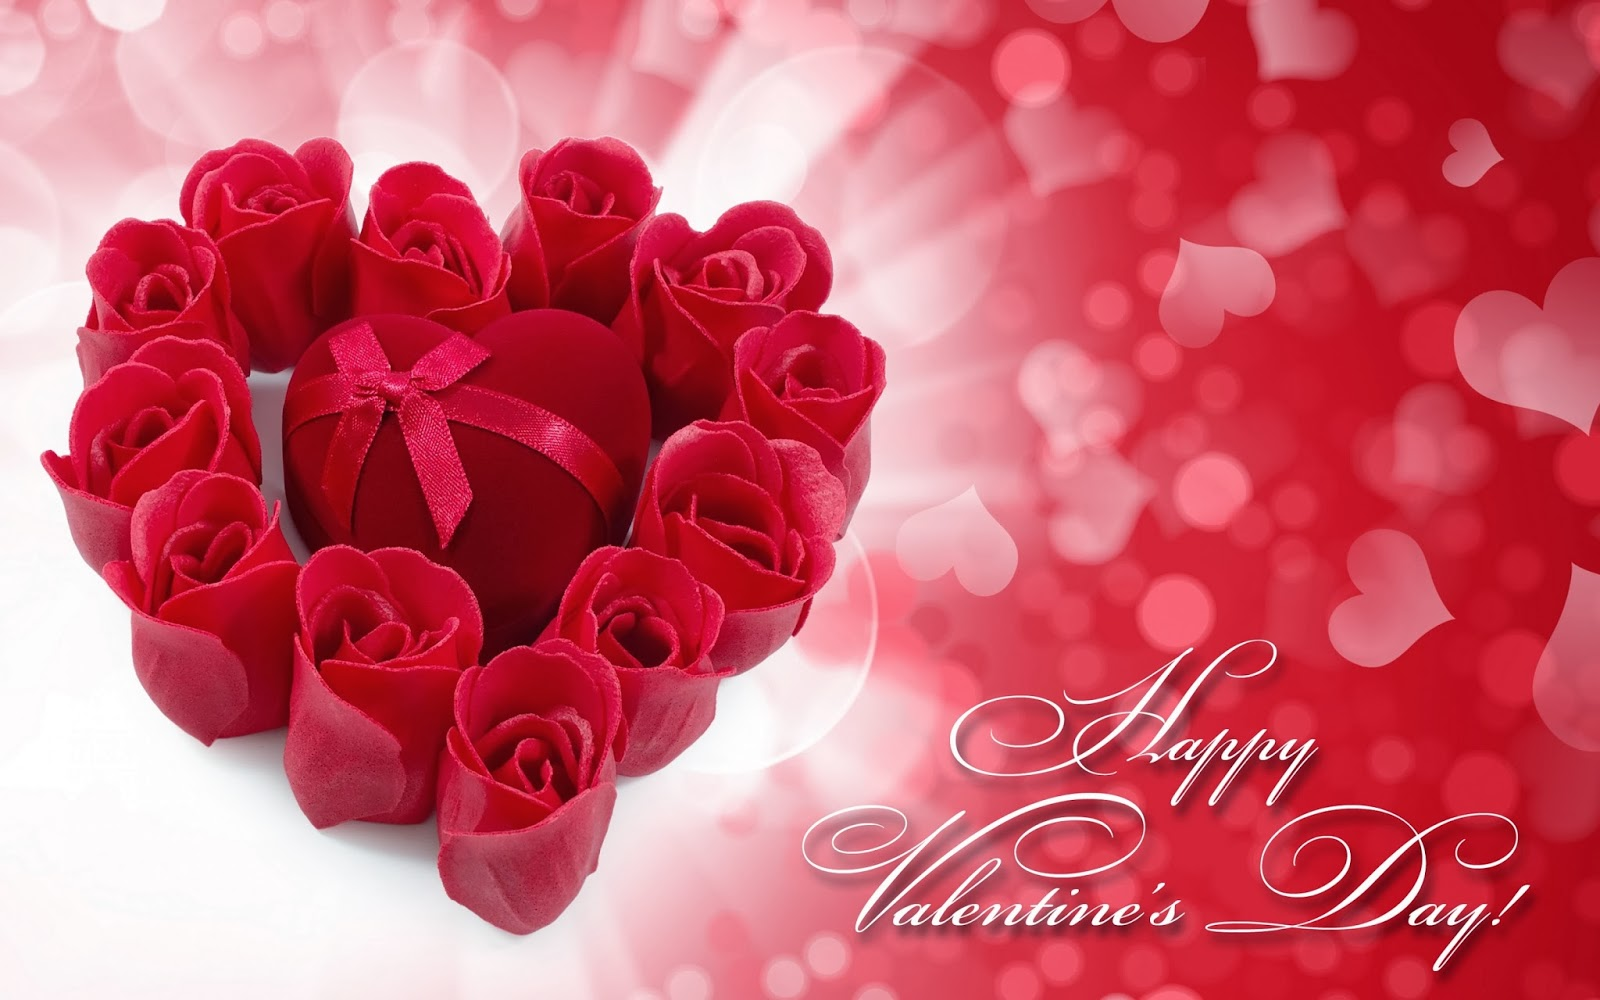 Happy Valentines day 2015 wallpaper 1600x1000